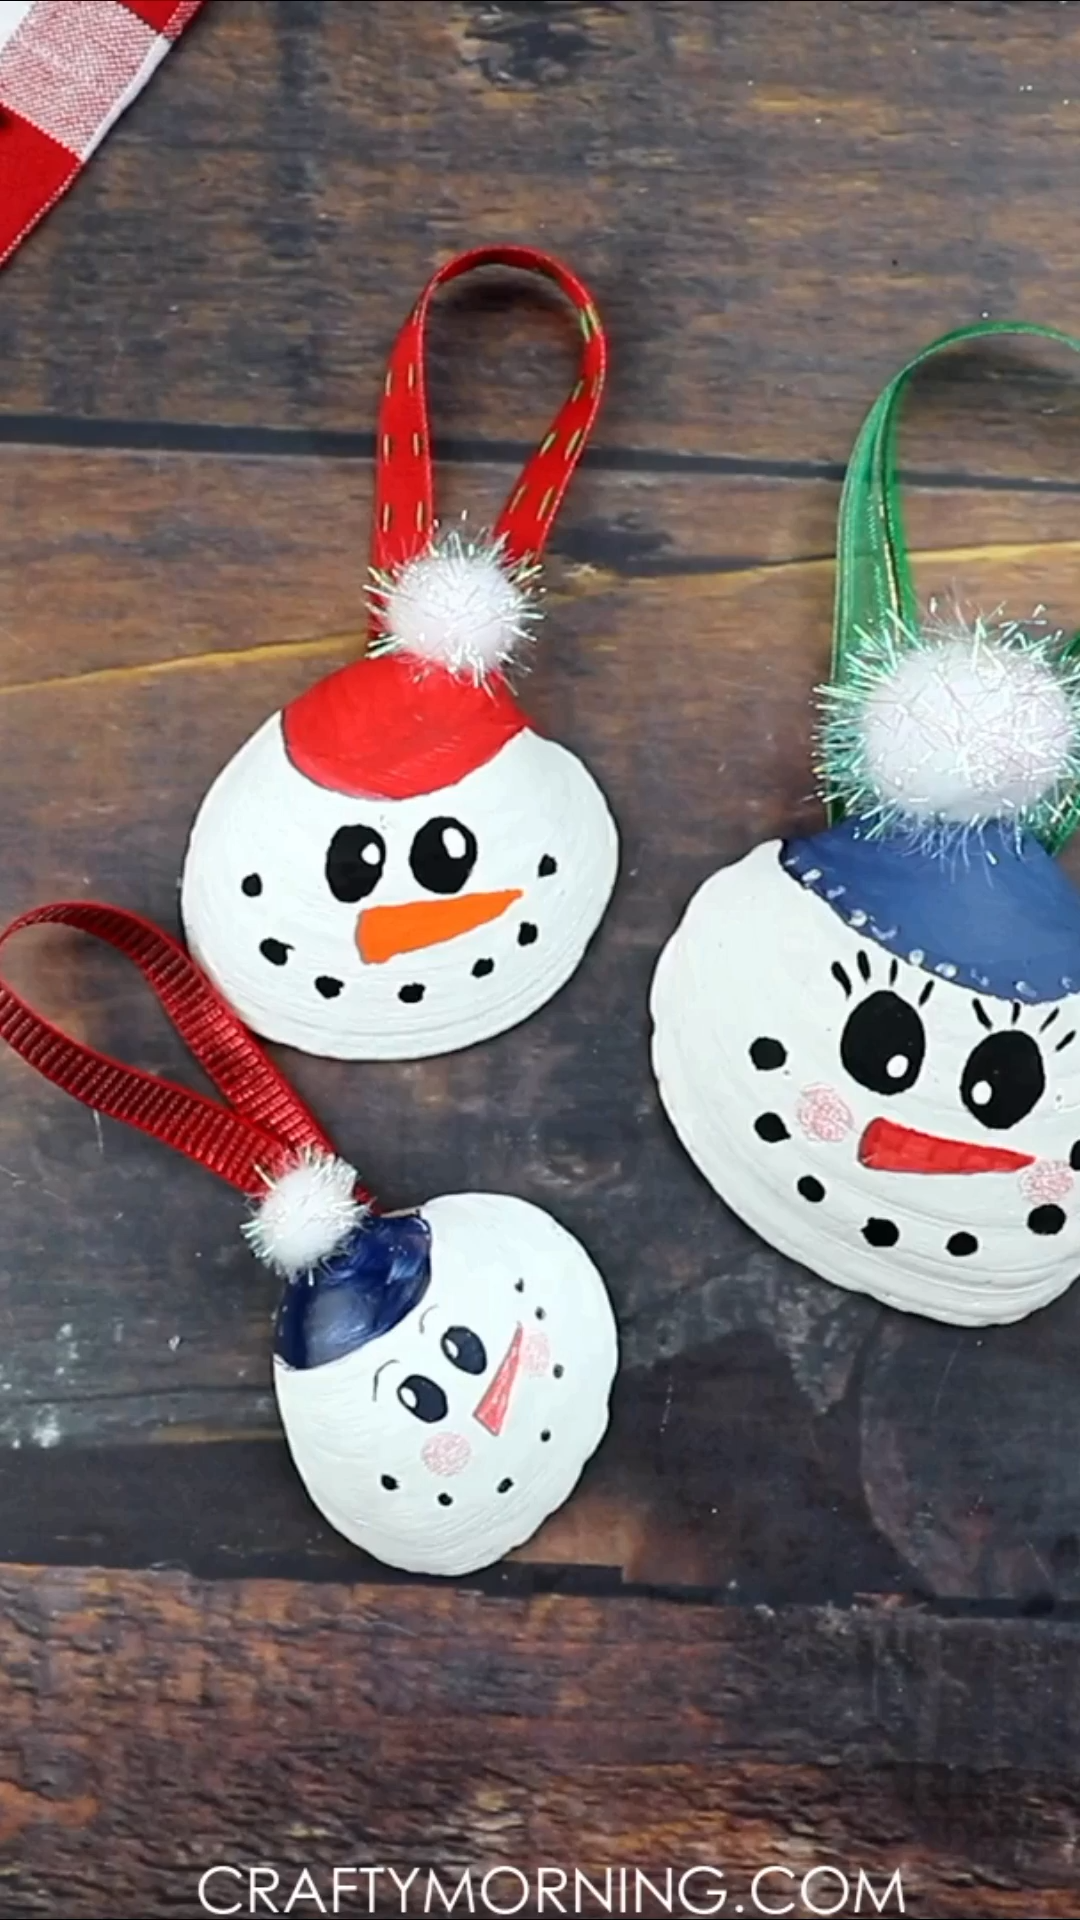 Snowman Seashell Ornaments Ornaments Seashell Snowman Christmas Diy Christmas Crafts Christmas Ornament Crafts